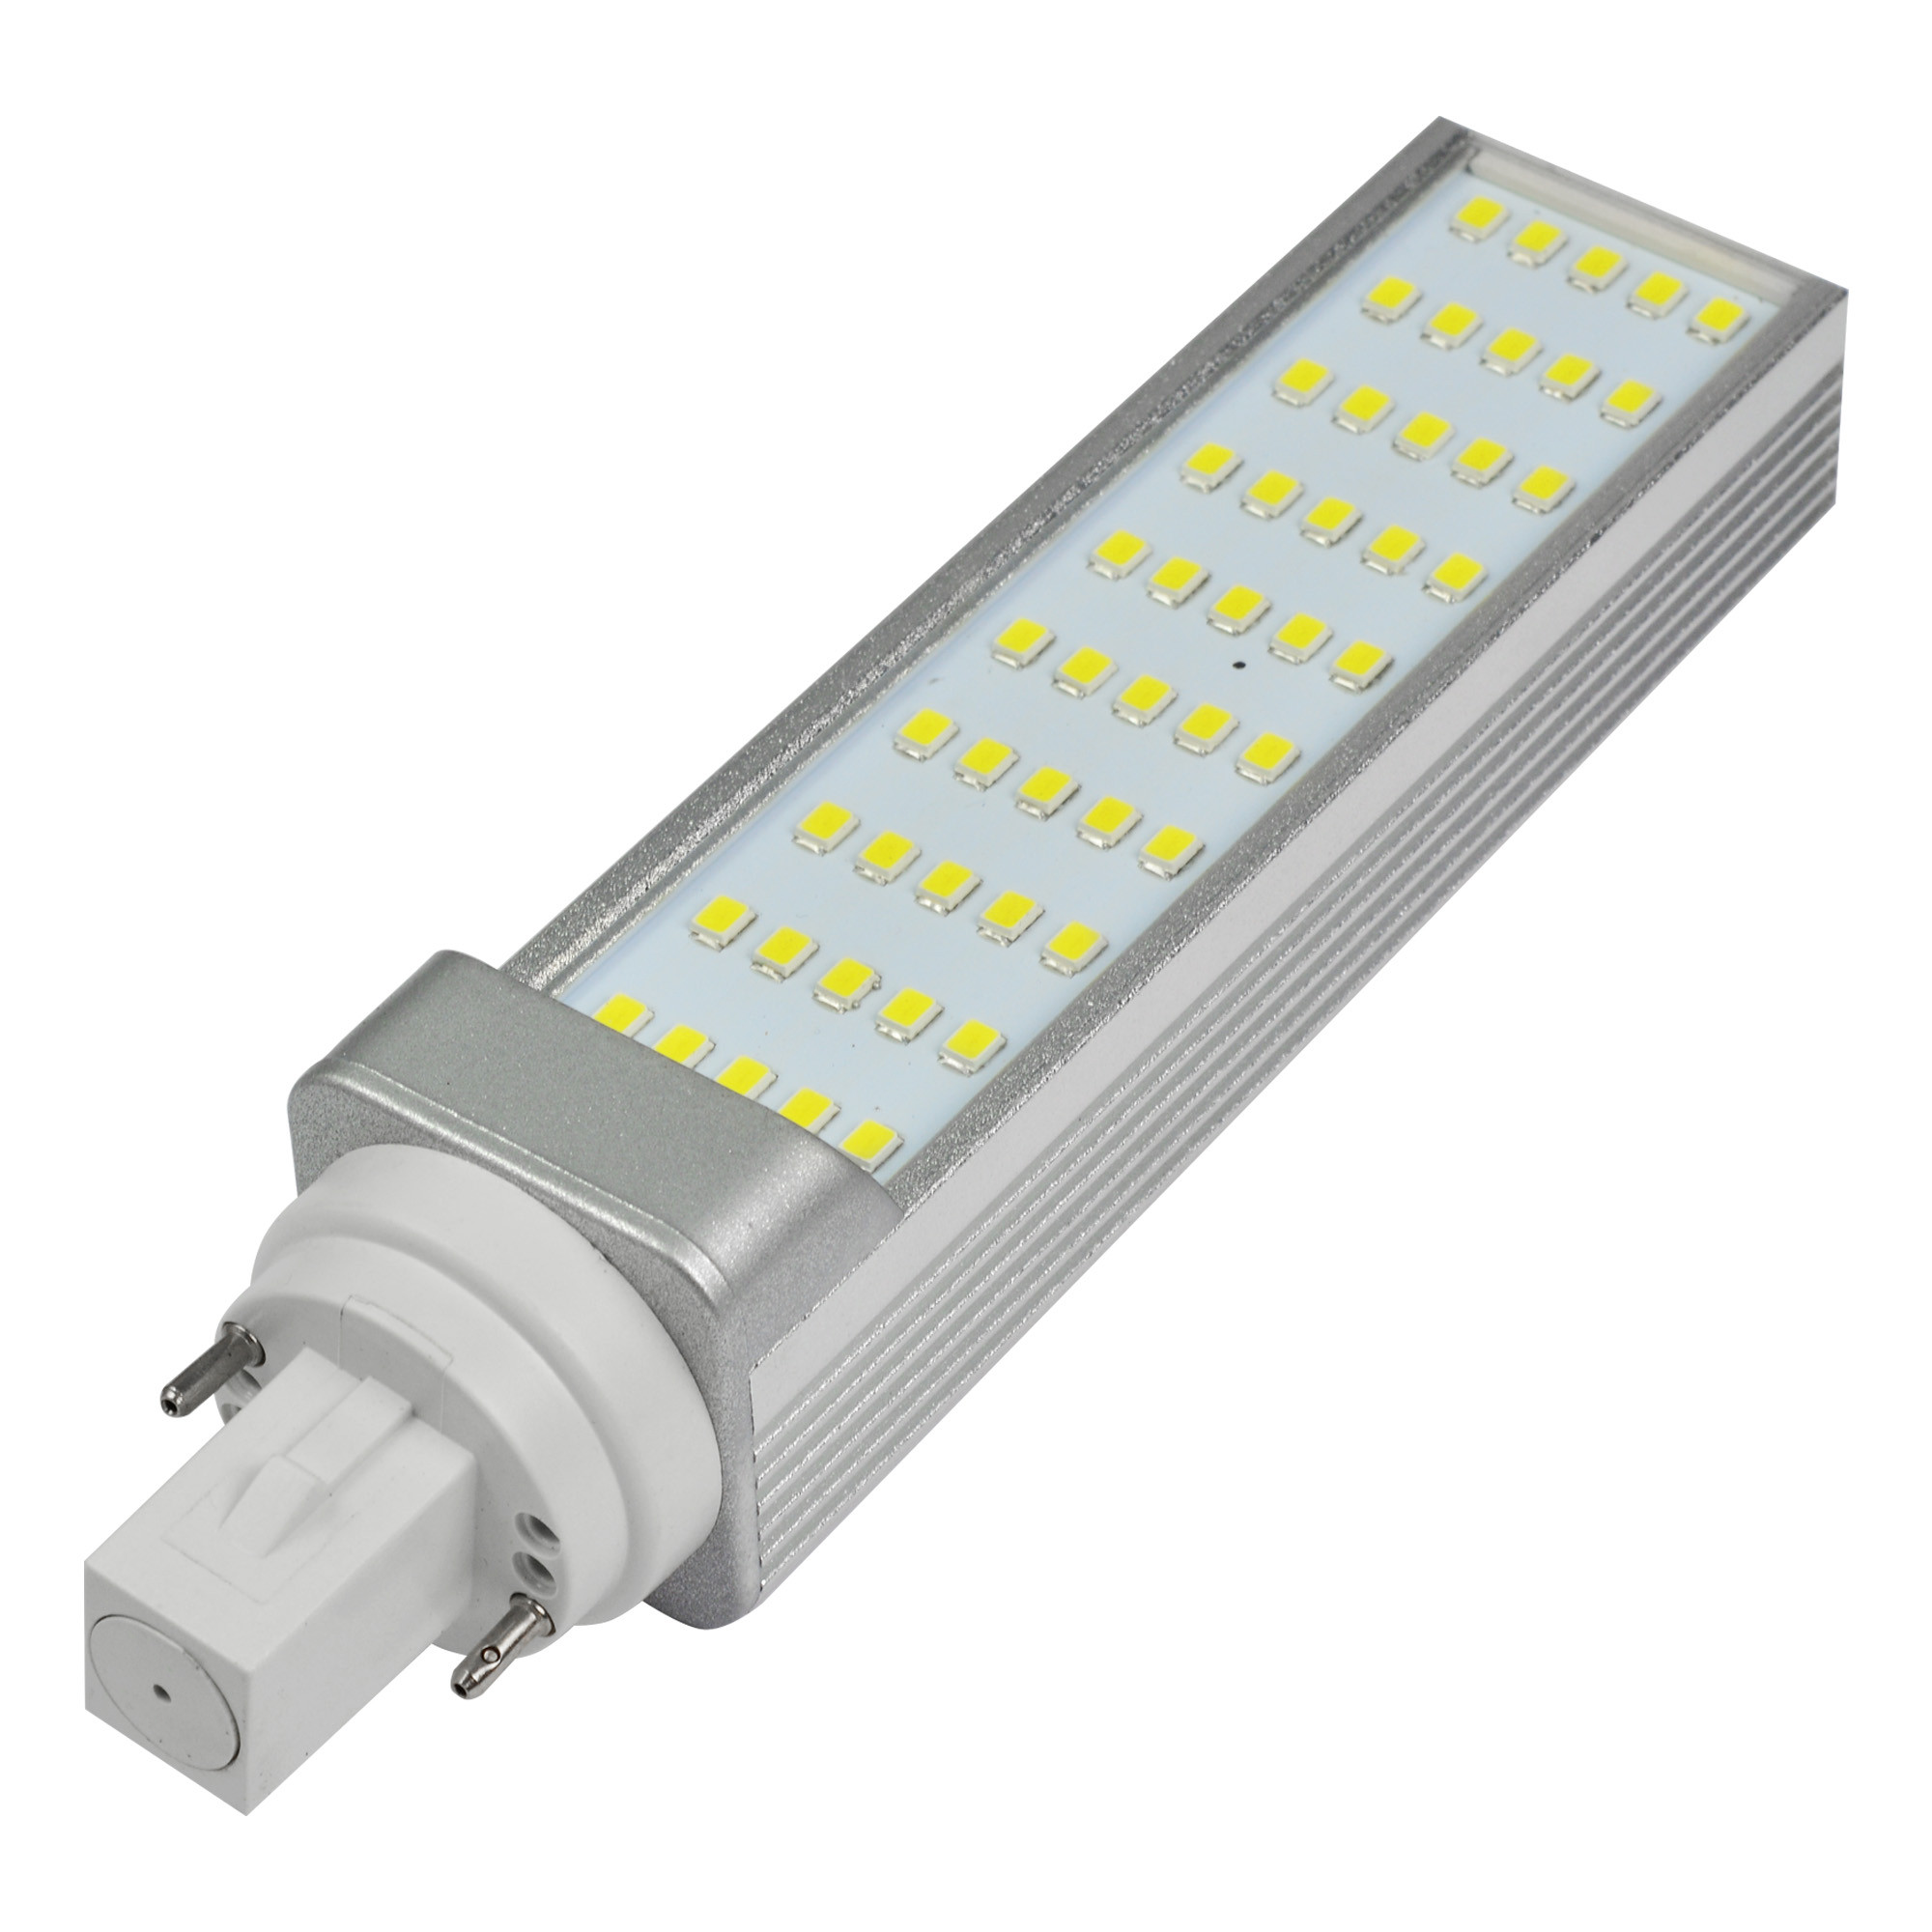 G24 10w Led Corn Light 50x 2835 Smd Bulb Lamp In Warm White Circuit Series 5b15dledcircuitjpgd Mengs